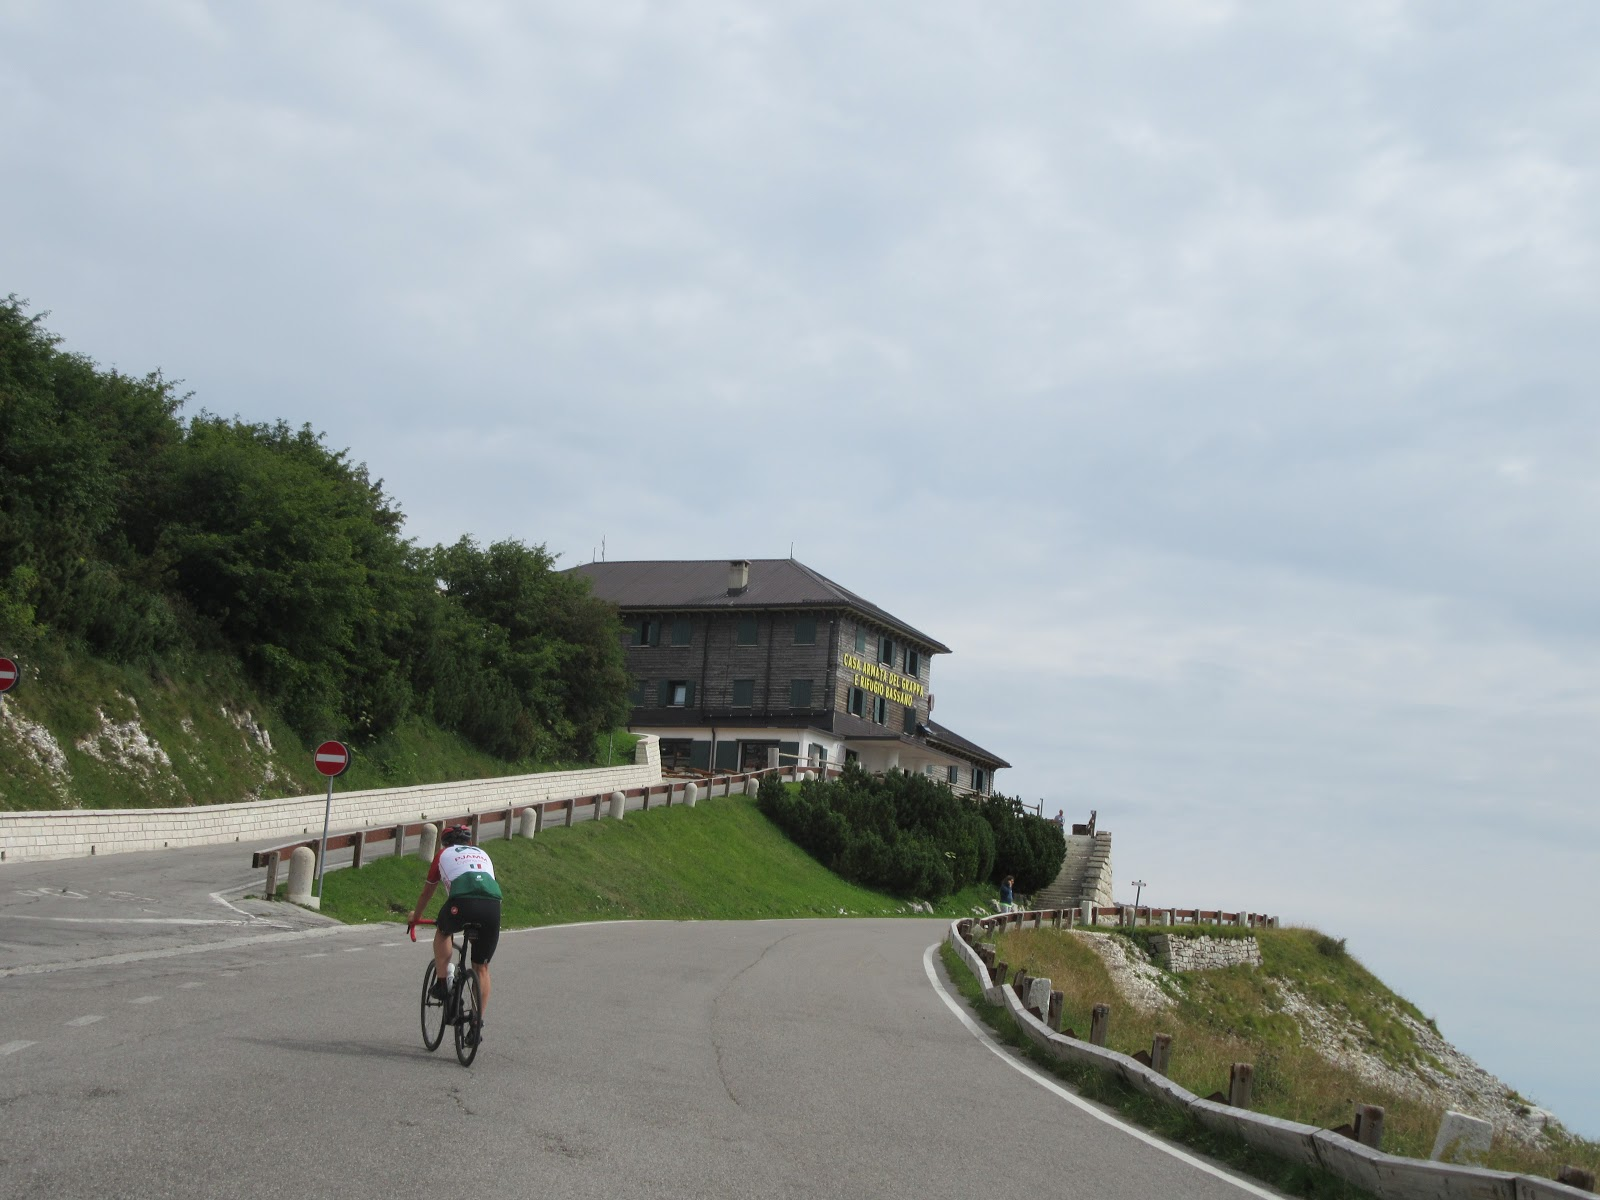 Cycling Monte Grappa from Fietta - cyclist riding on road to Rifugio Bassano a cima Grappa